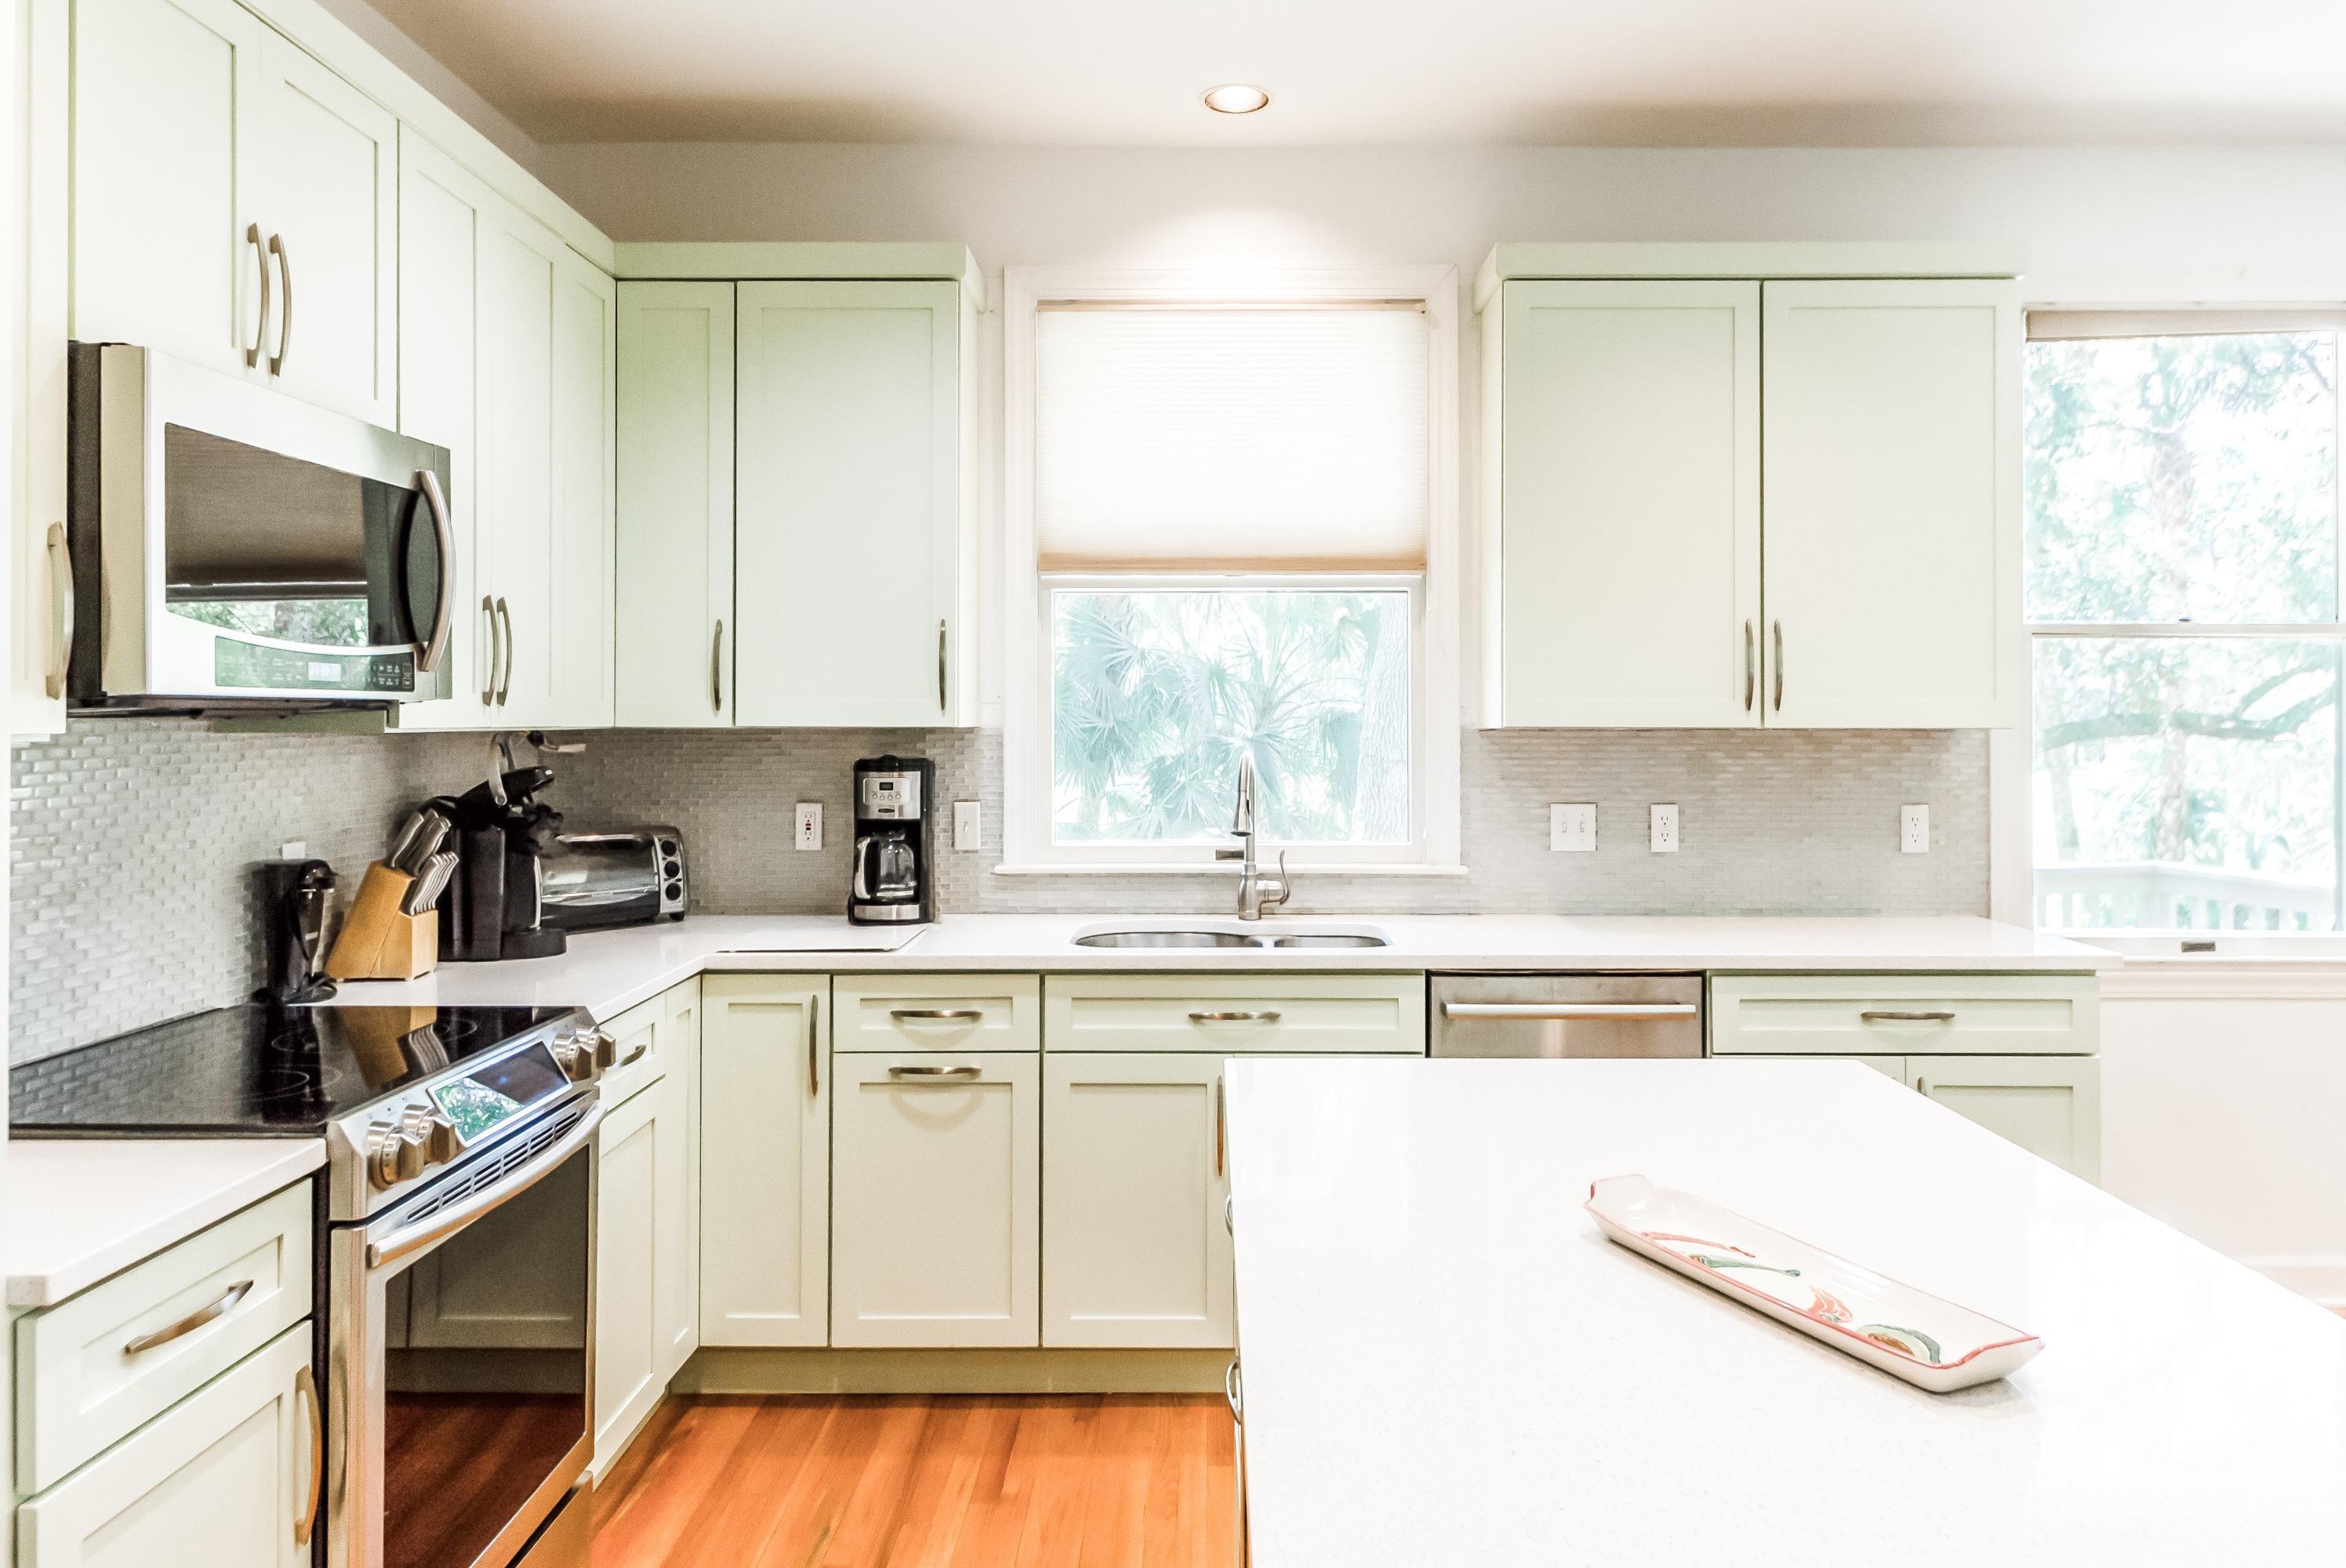 Kiawah Island Homes For Sale - 45 Cotton Hall, Kiawah Island, SC - 15